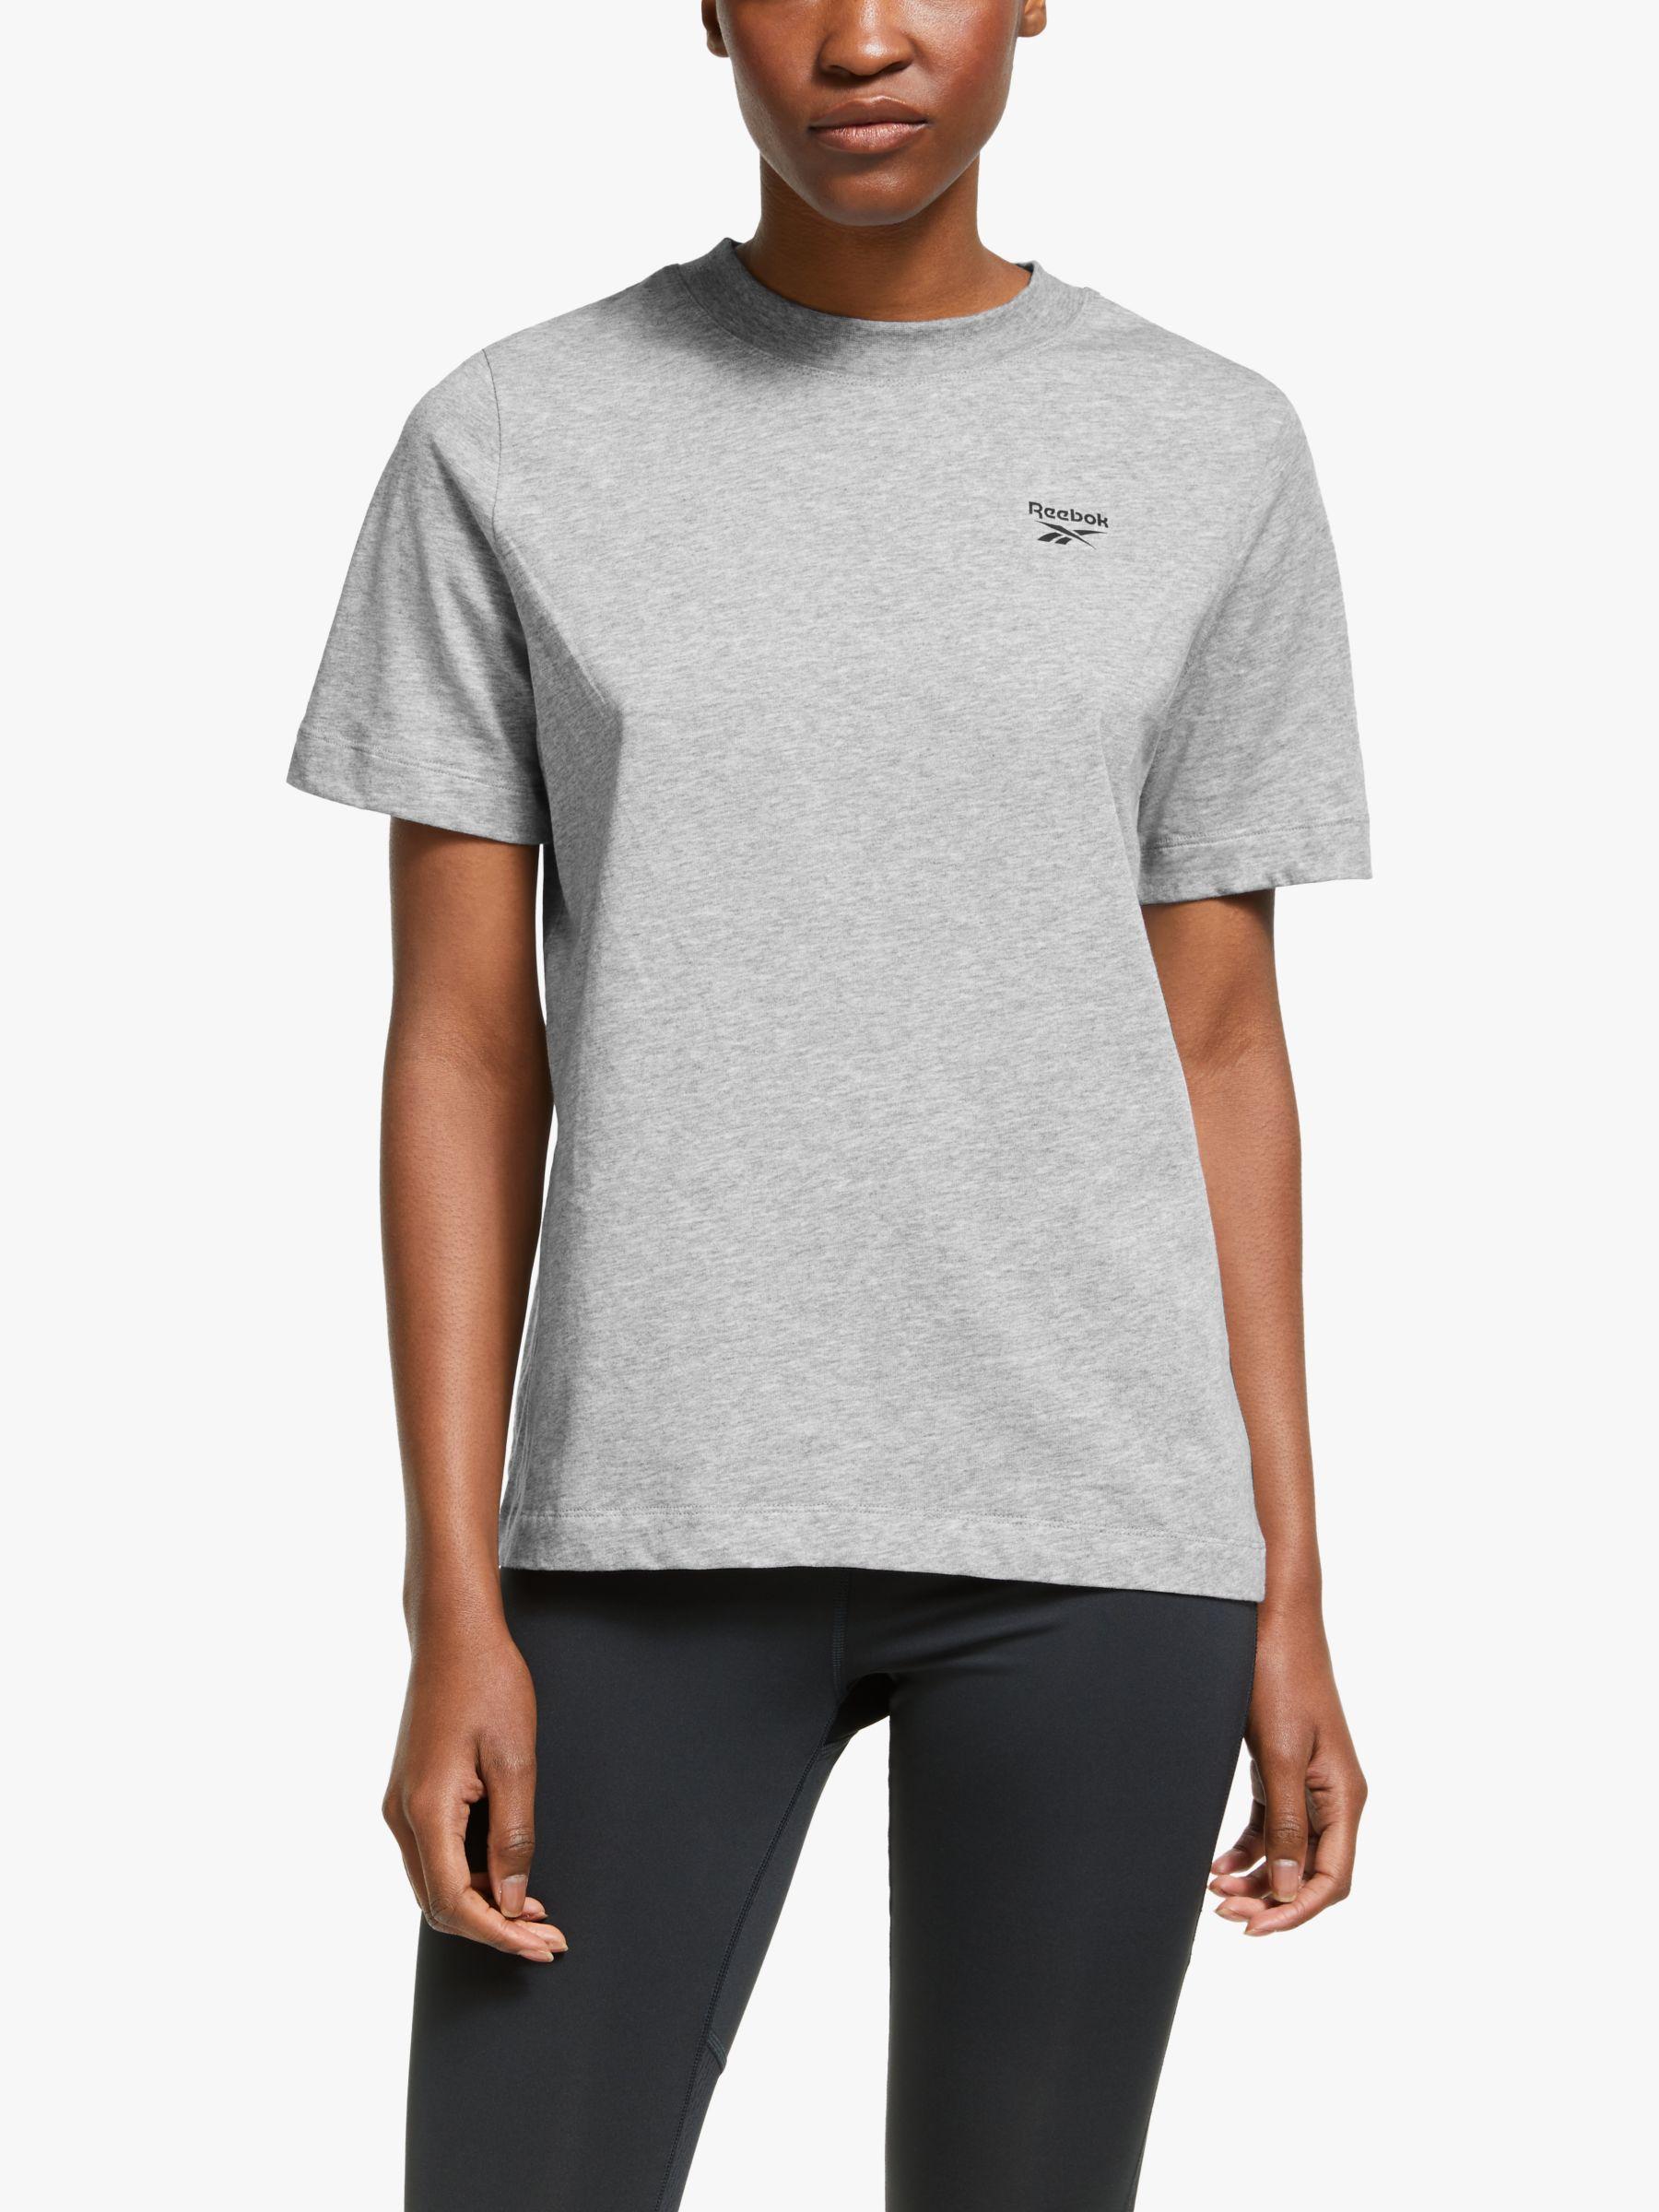 Reebok Reebok Training Essentials Easy Logo T-Shirt, Medium Grey Heather